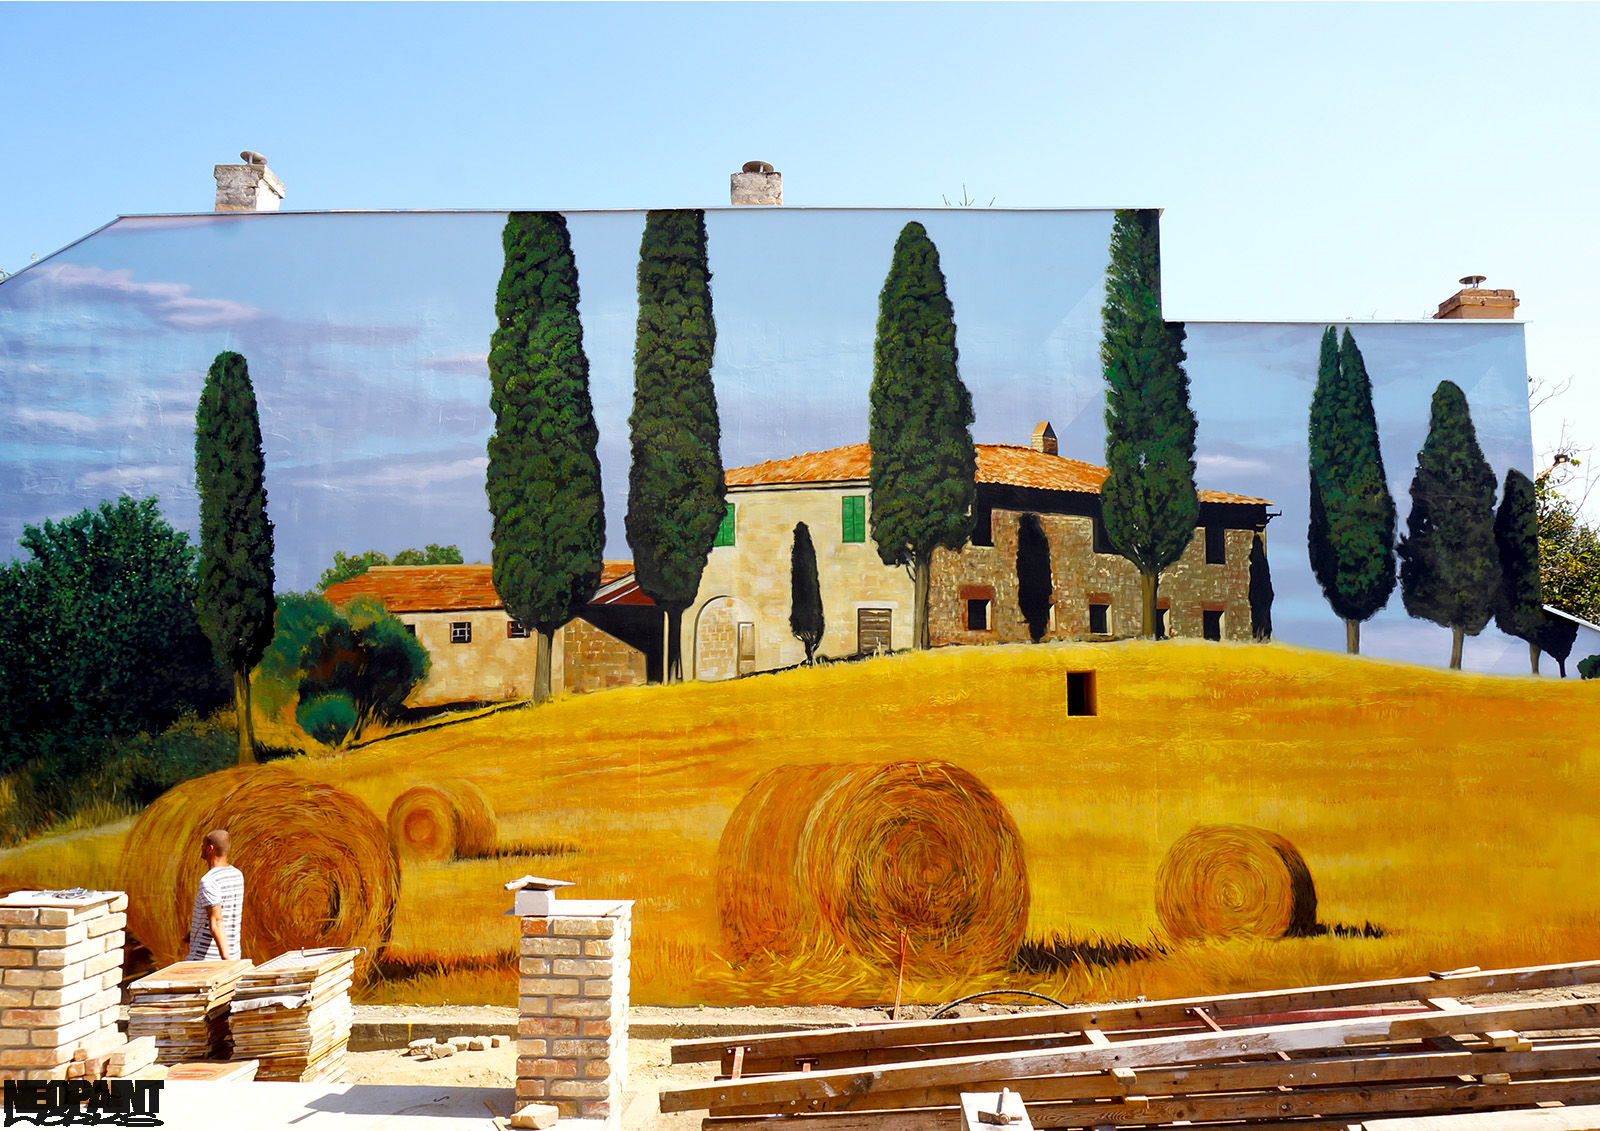 neopaint works - nagy falfestmény - toscana